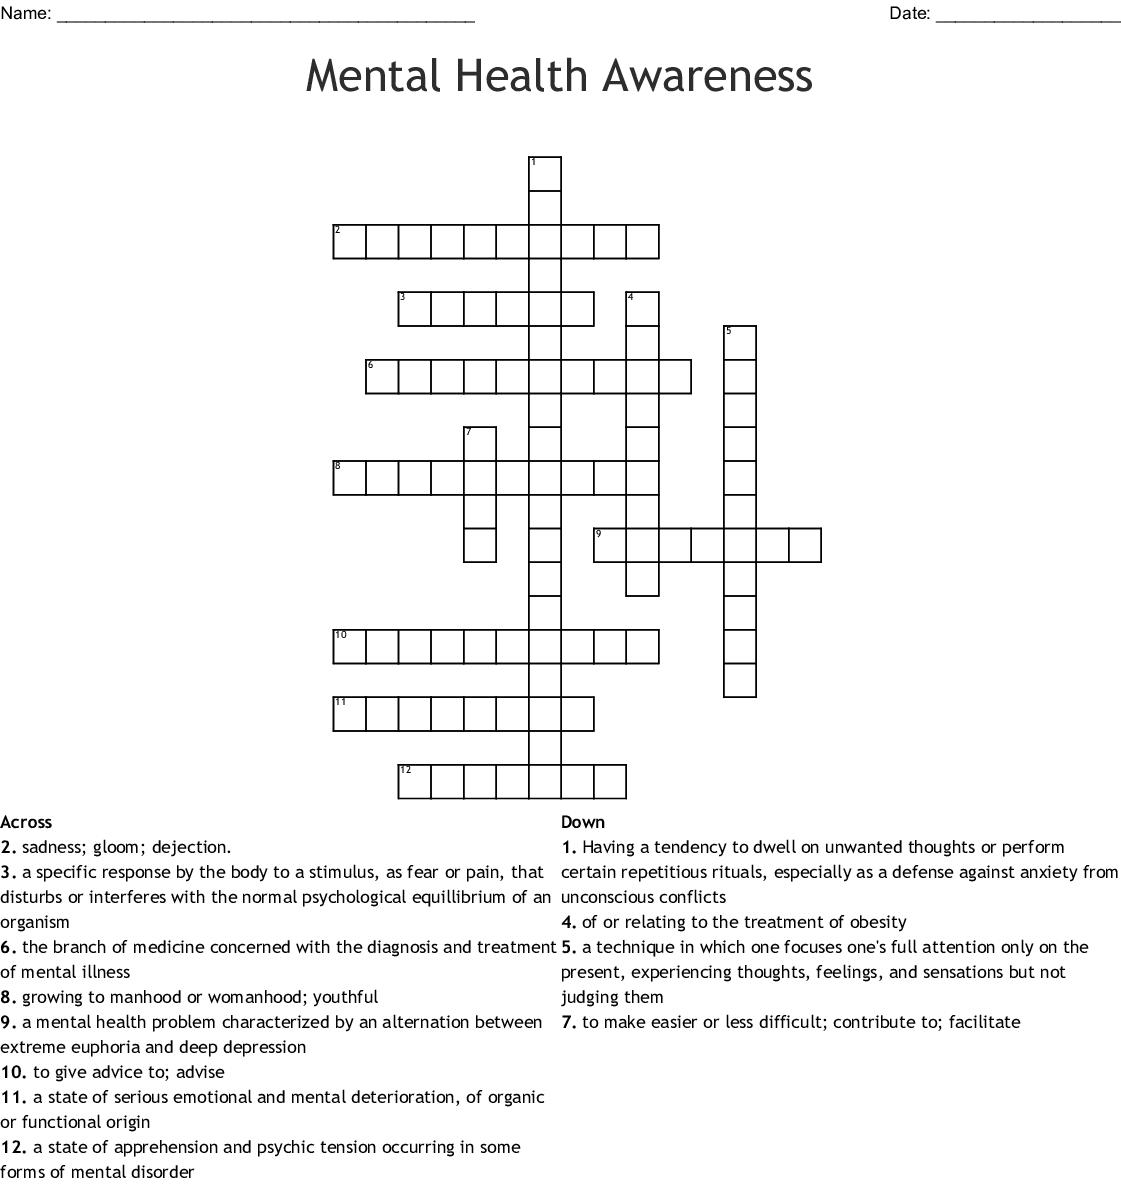 Mental Health Awareness Crossword - Wordmint - Printable Mental Health Crossword Puzzle